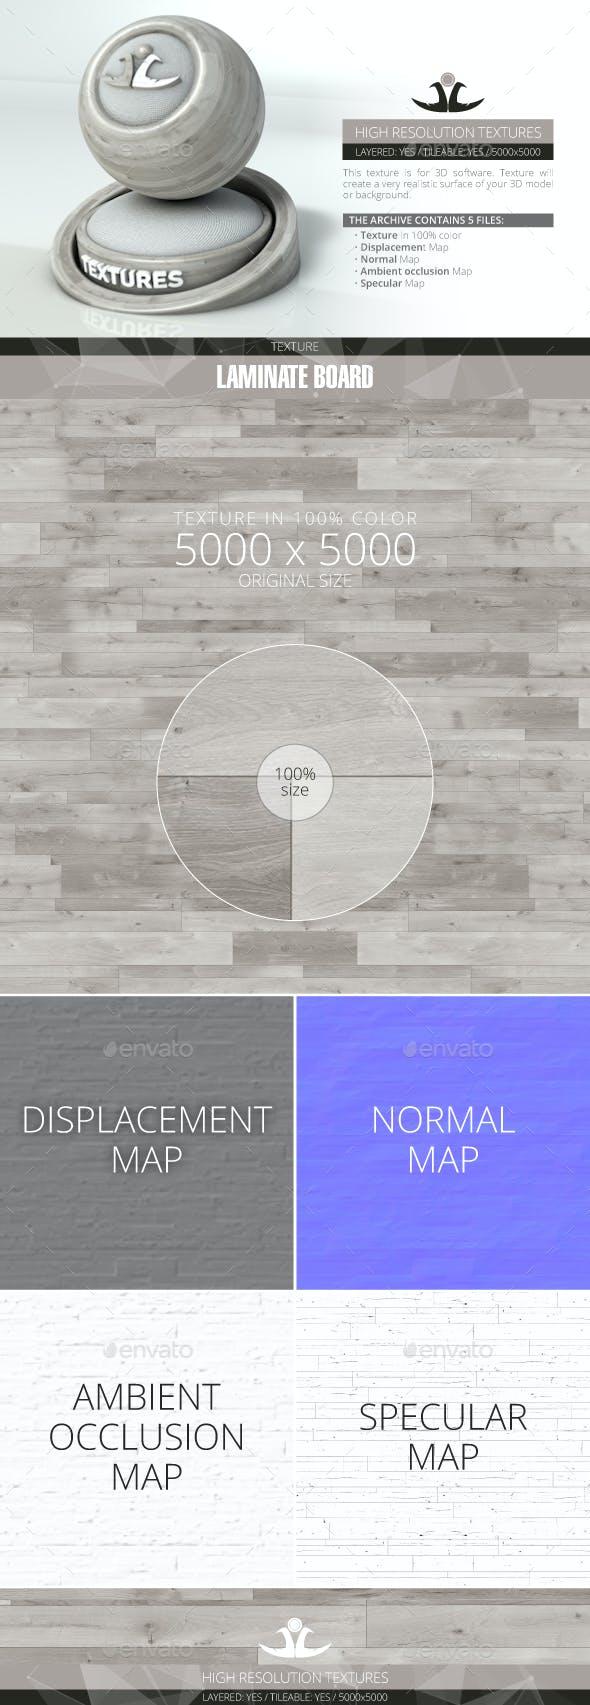 Laminate Board 46 - 3DOcean Item for Sale